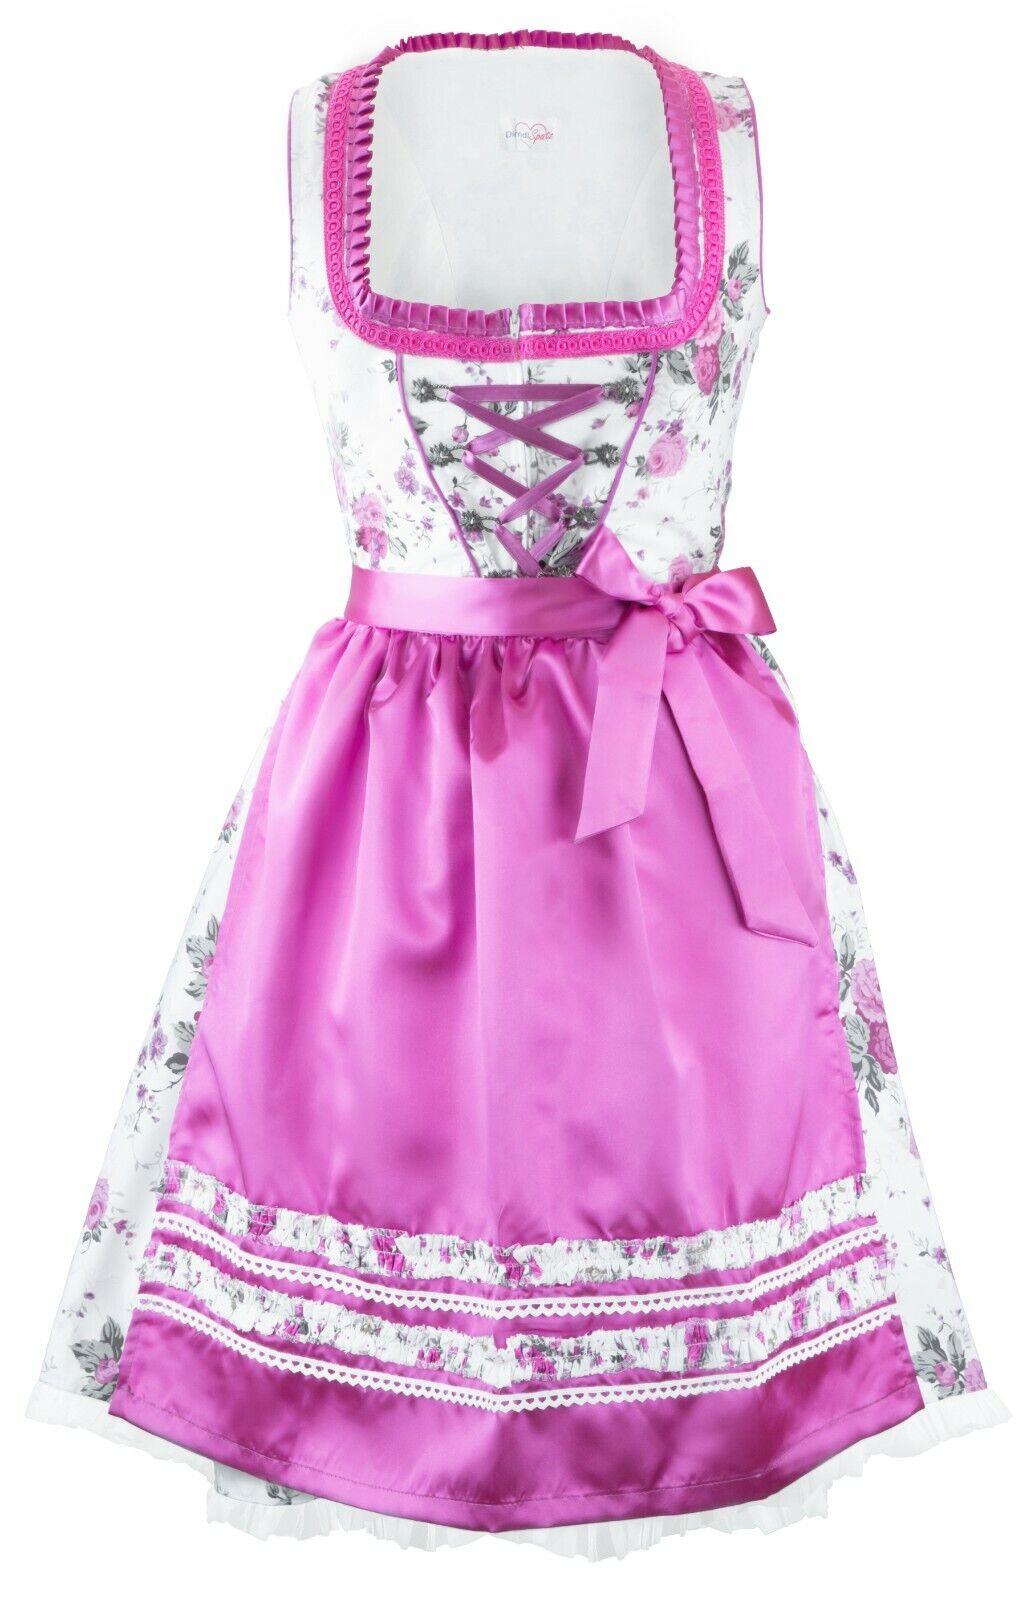 e1928f232b8182 Midi Midi Midi Dirndl 3-teilig Set Mididirndl Trachtenkleid Oktoberfest  Kleid Gr 34 - 54 b7c0b0